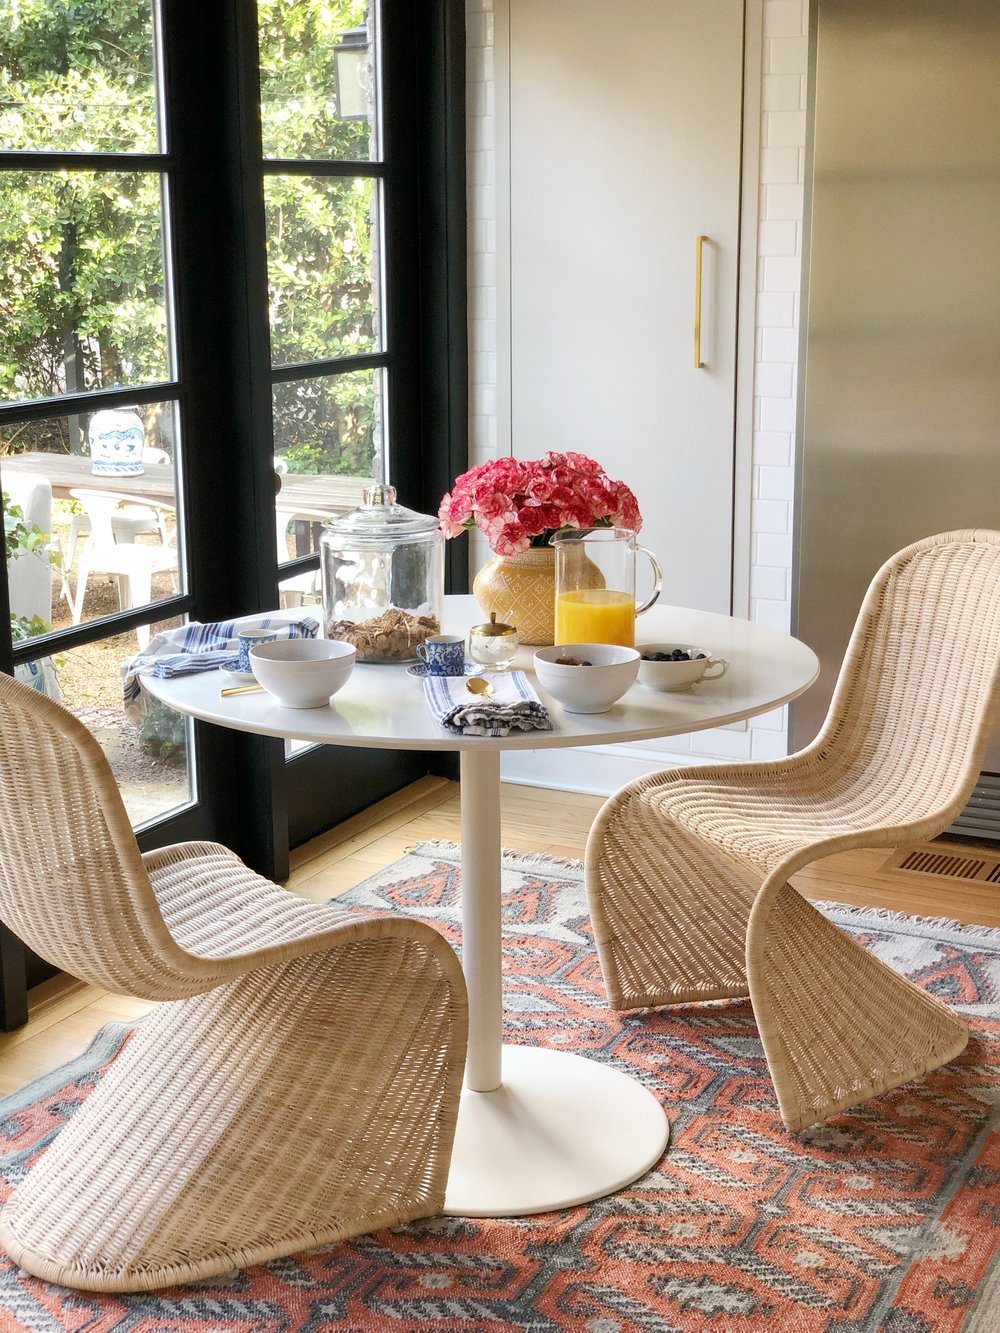 Set Of 2 Rattan Dining Chairs Similar Flatweave Rug Glass Jar Fridge